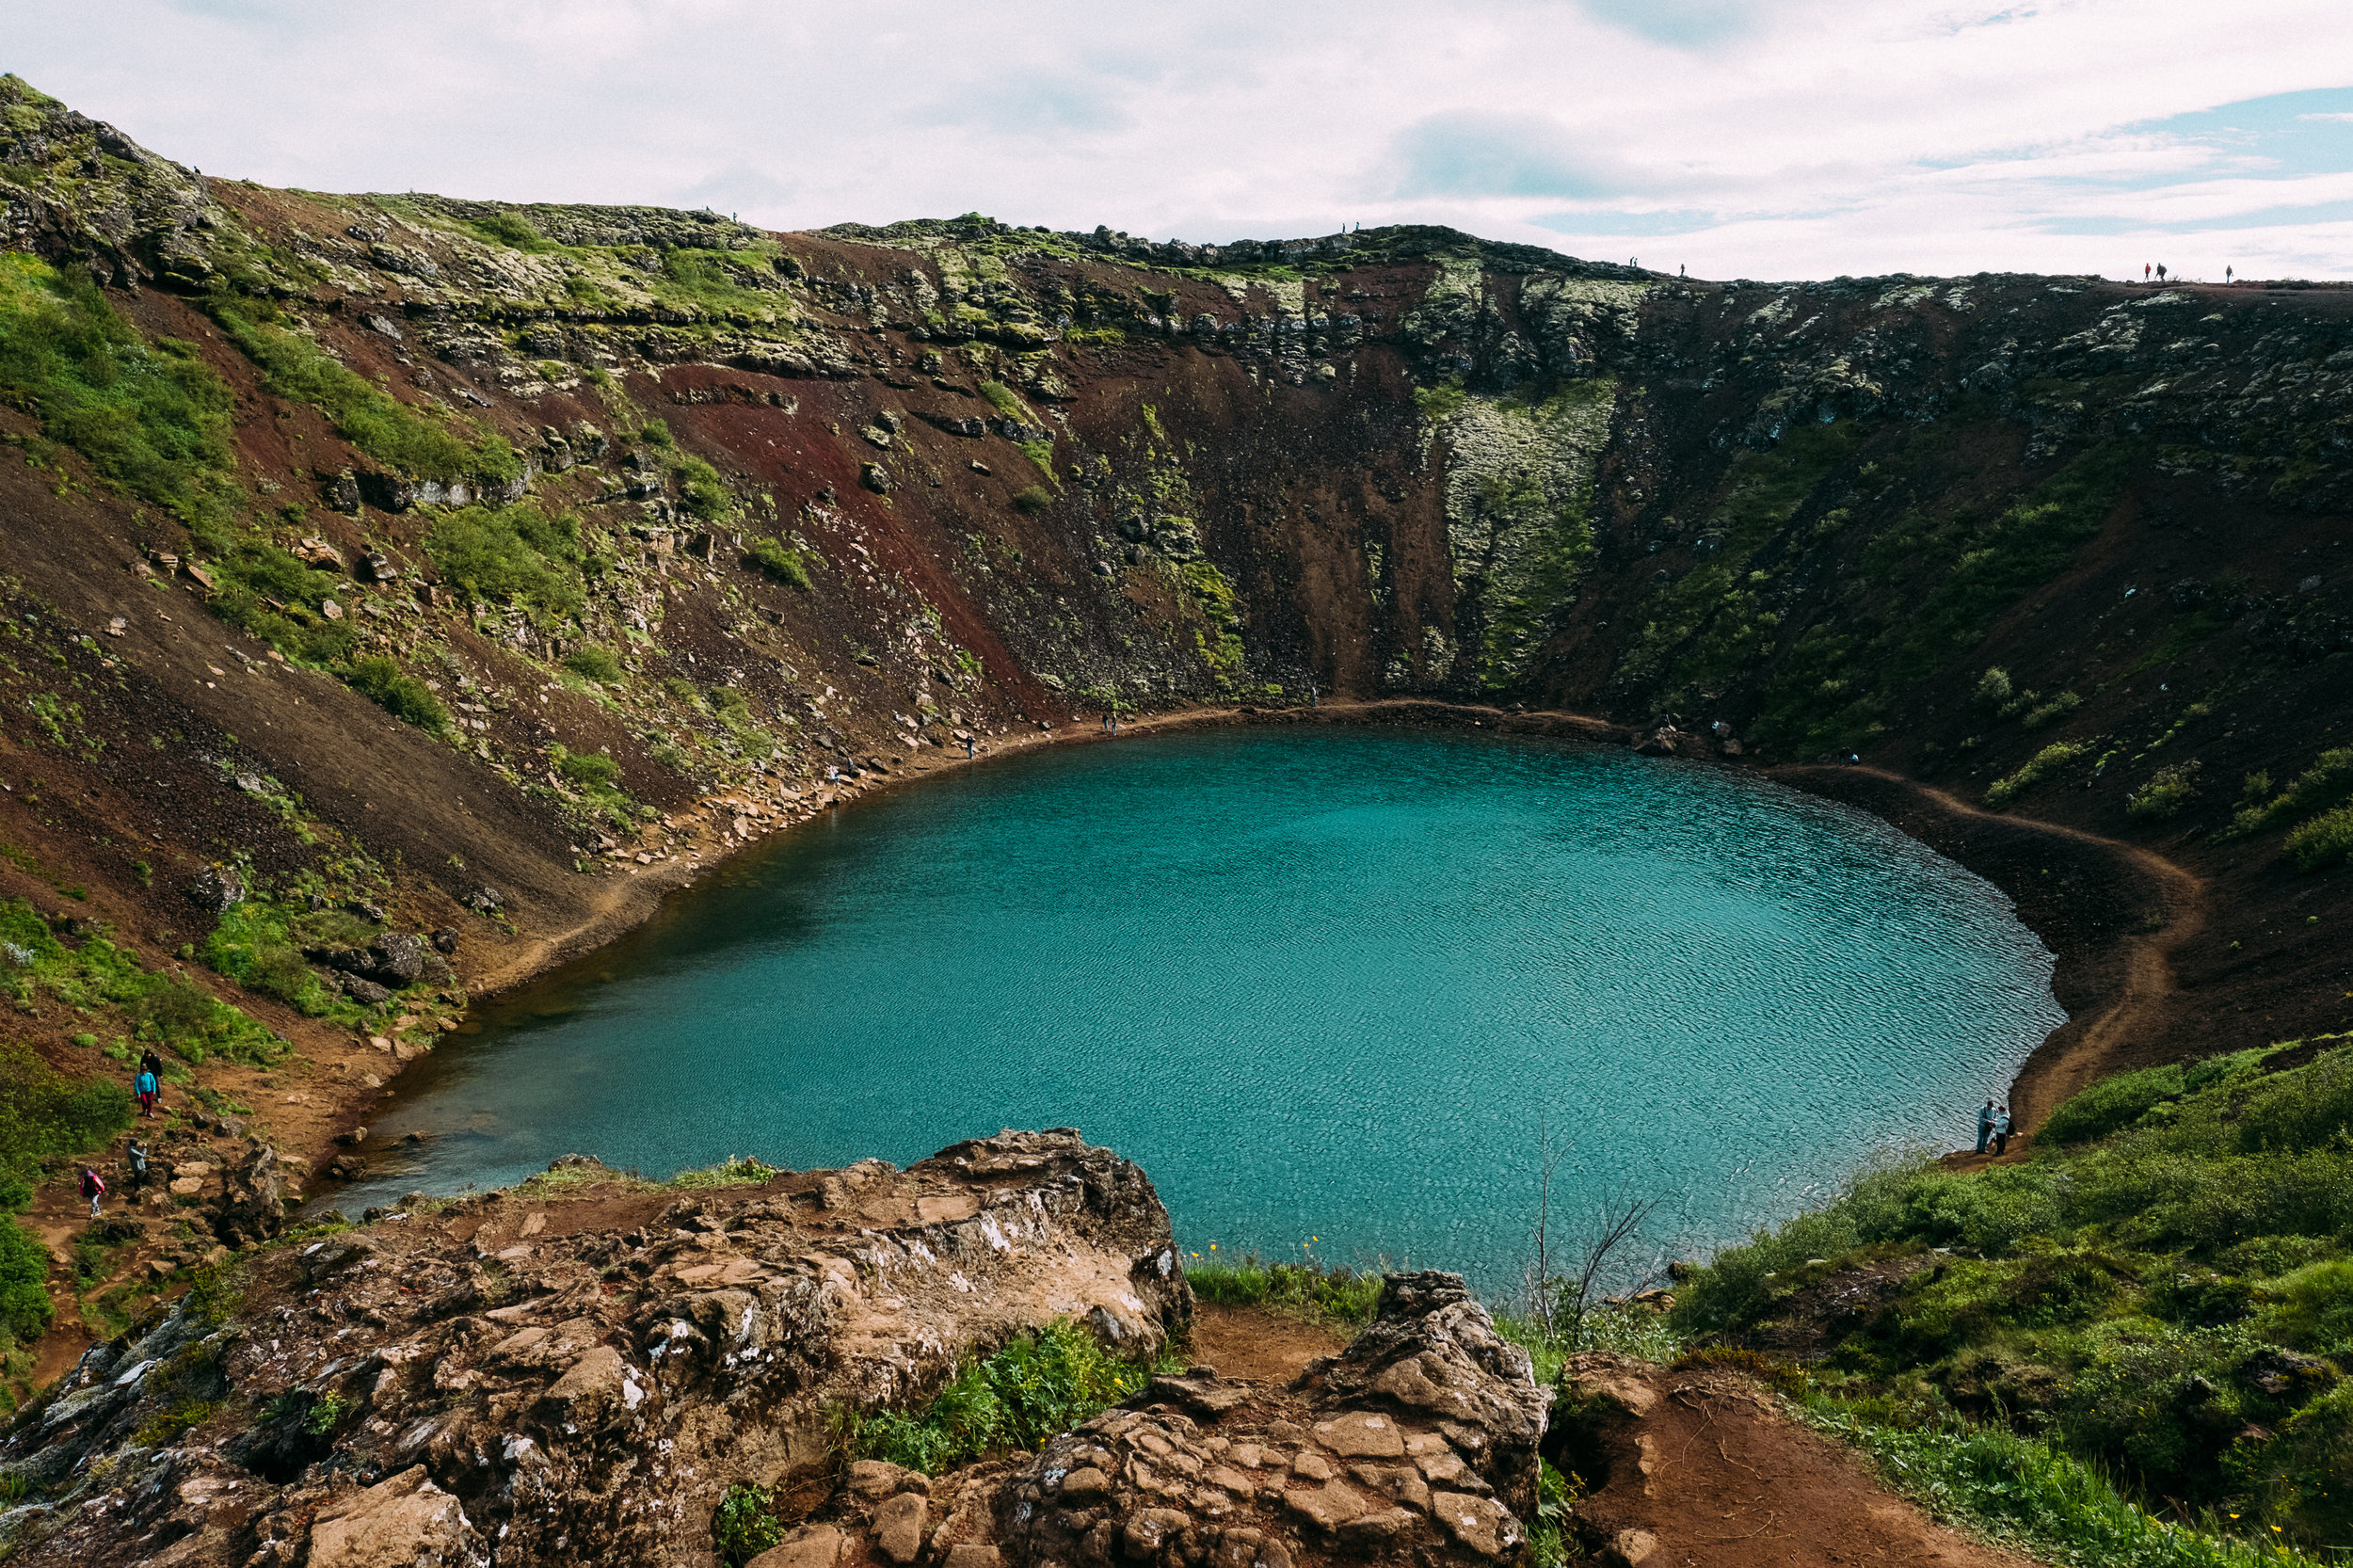 Kerid Crater -  [64.1076371,-20.9471584]  Fuji X-H1 + 16mm 1.4 lens